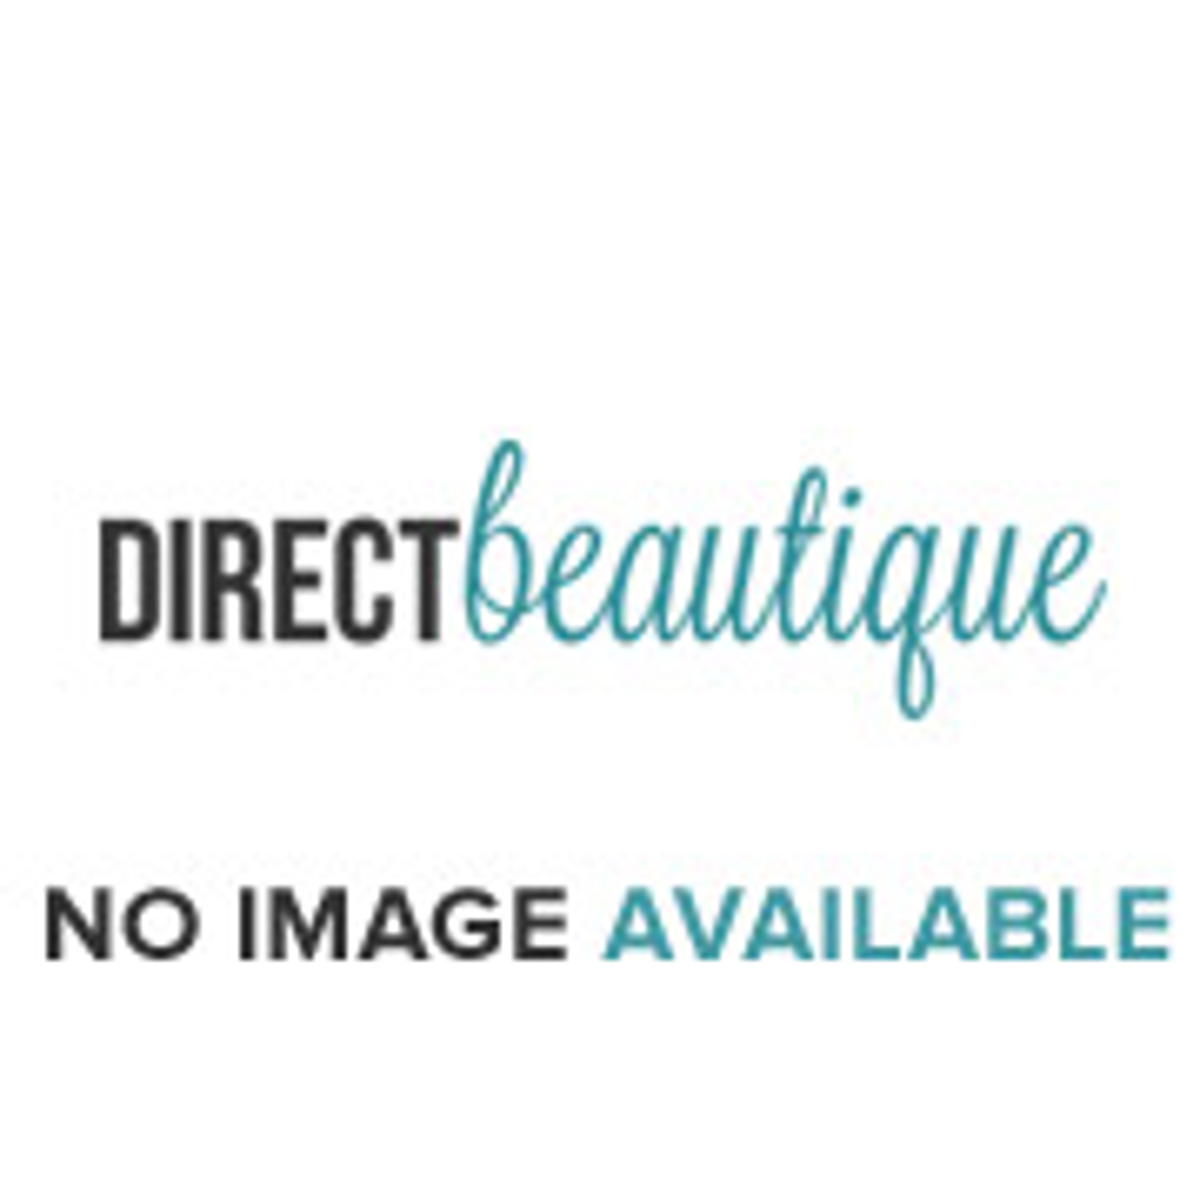 Ghost 30ml EDT Spray / 50ml Moisturising Body Lotion